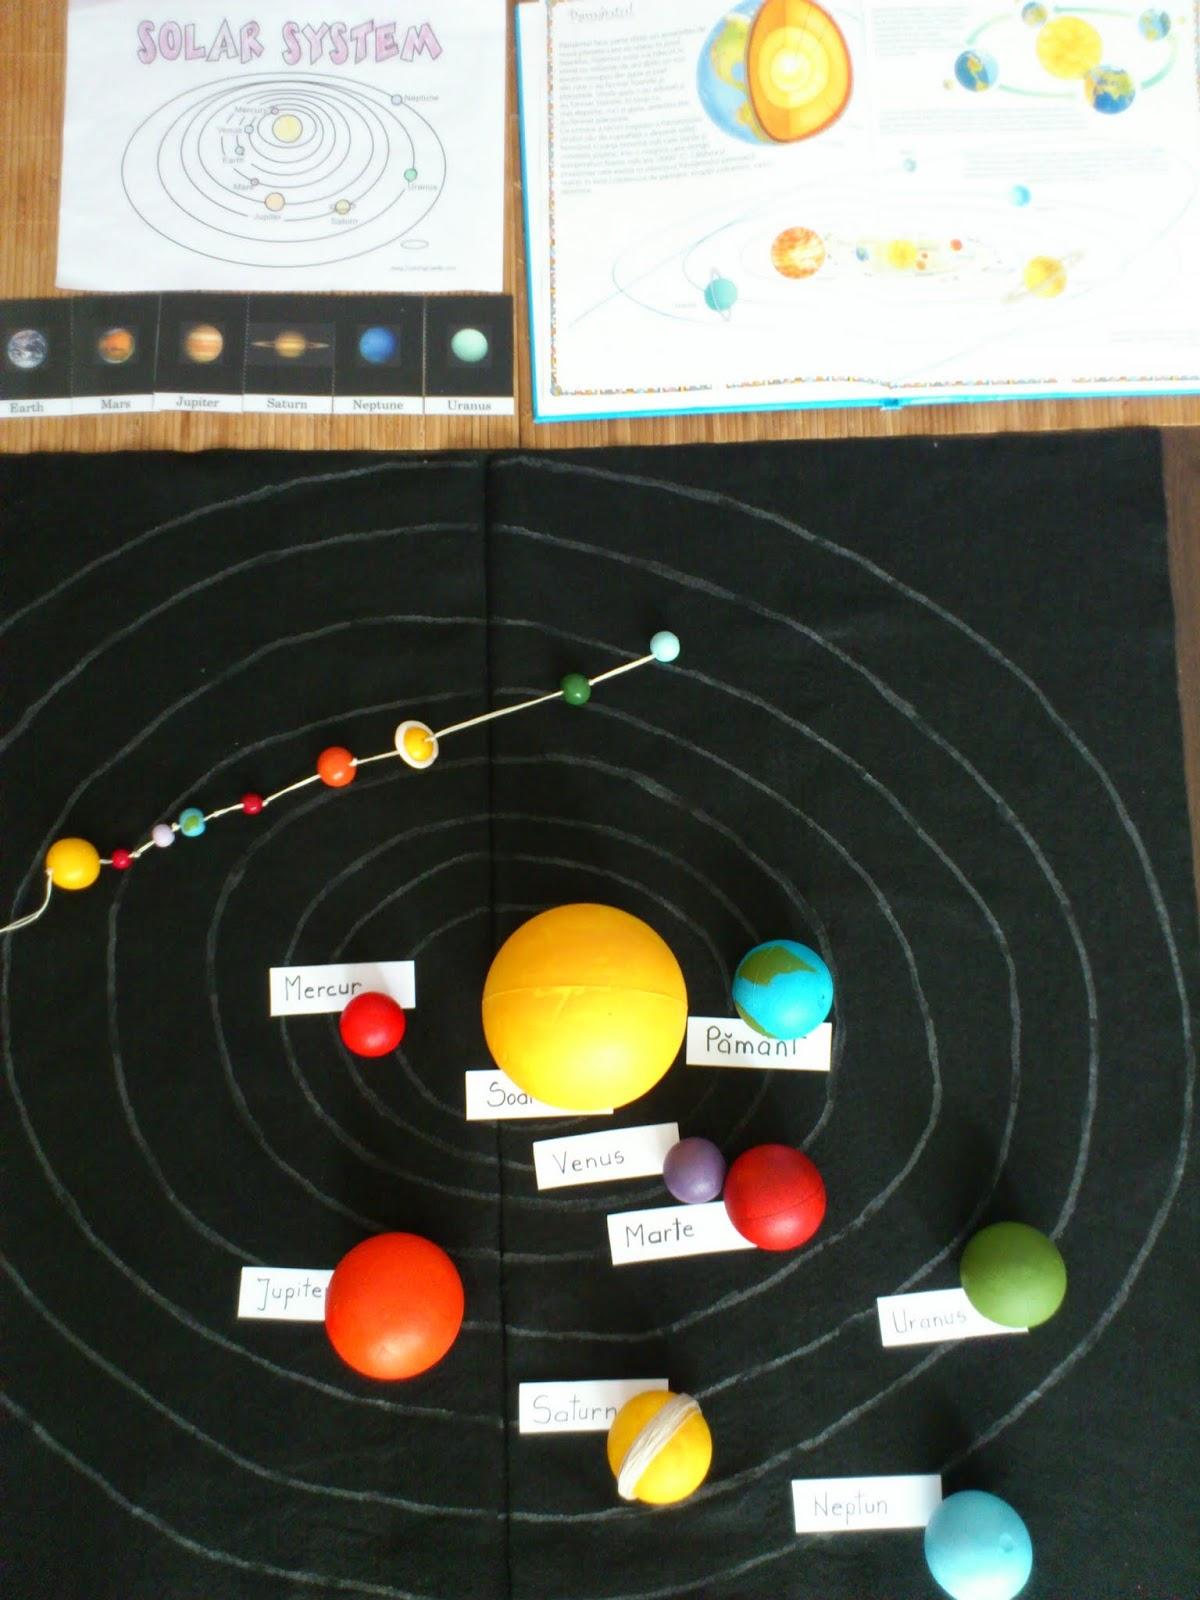 Totul despre sistemul solar ☼ - YouTube  |Sistemul Solar